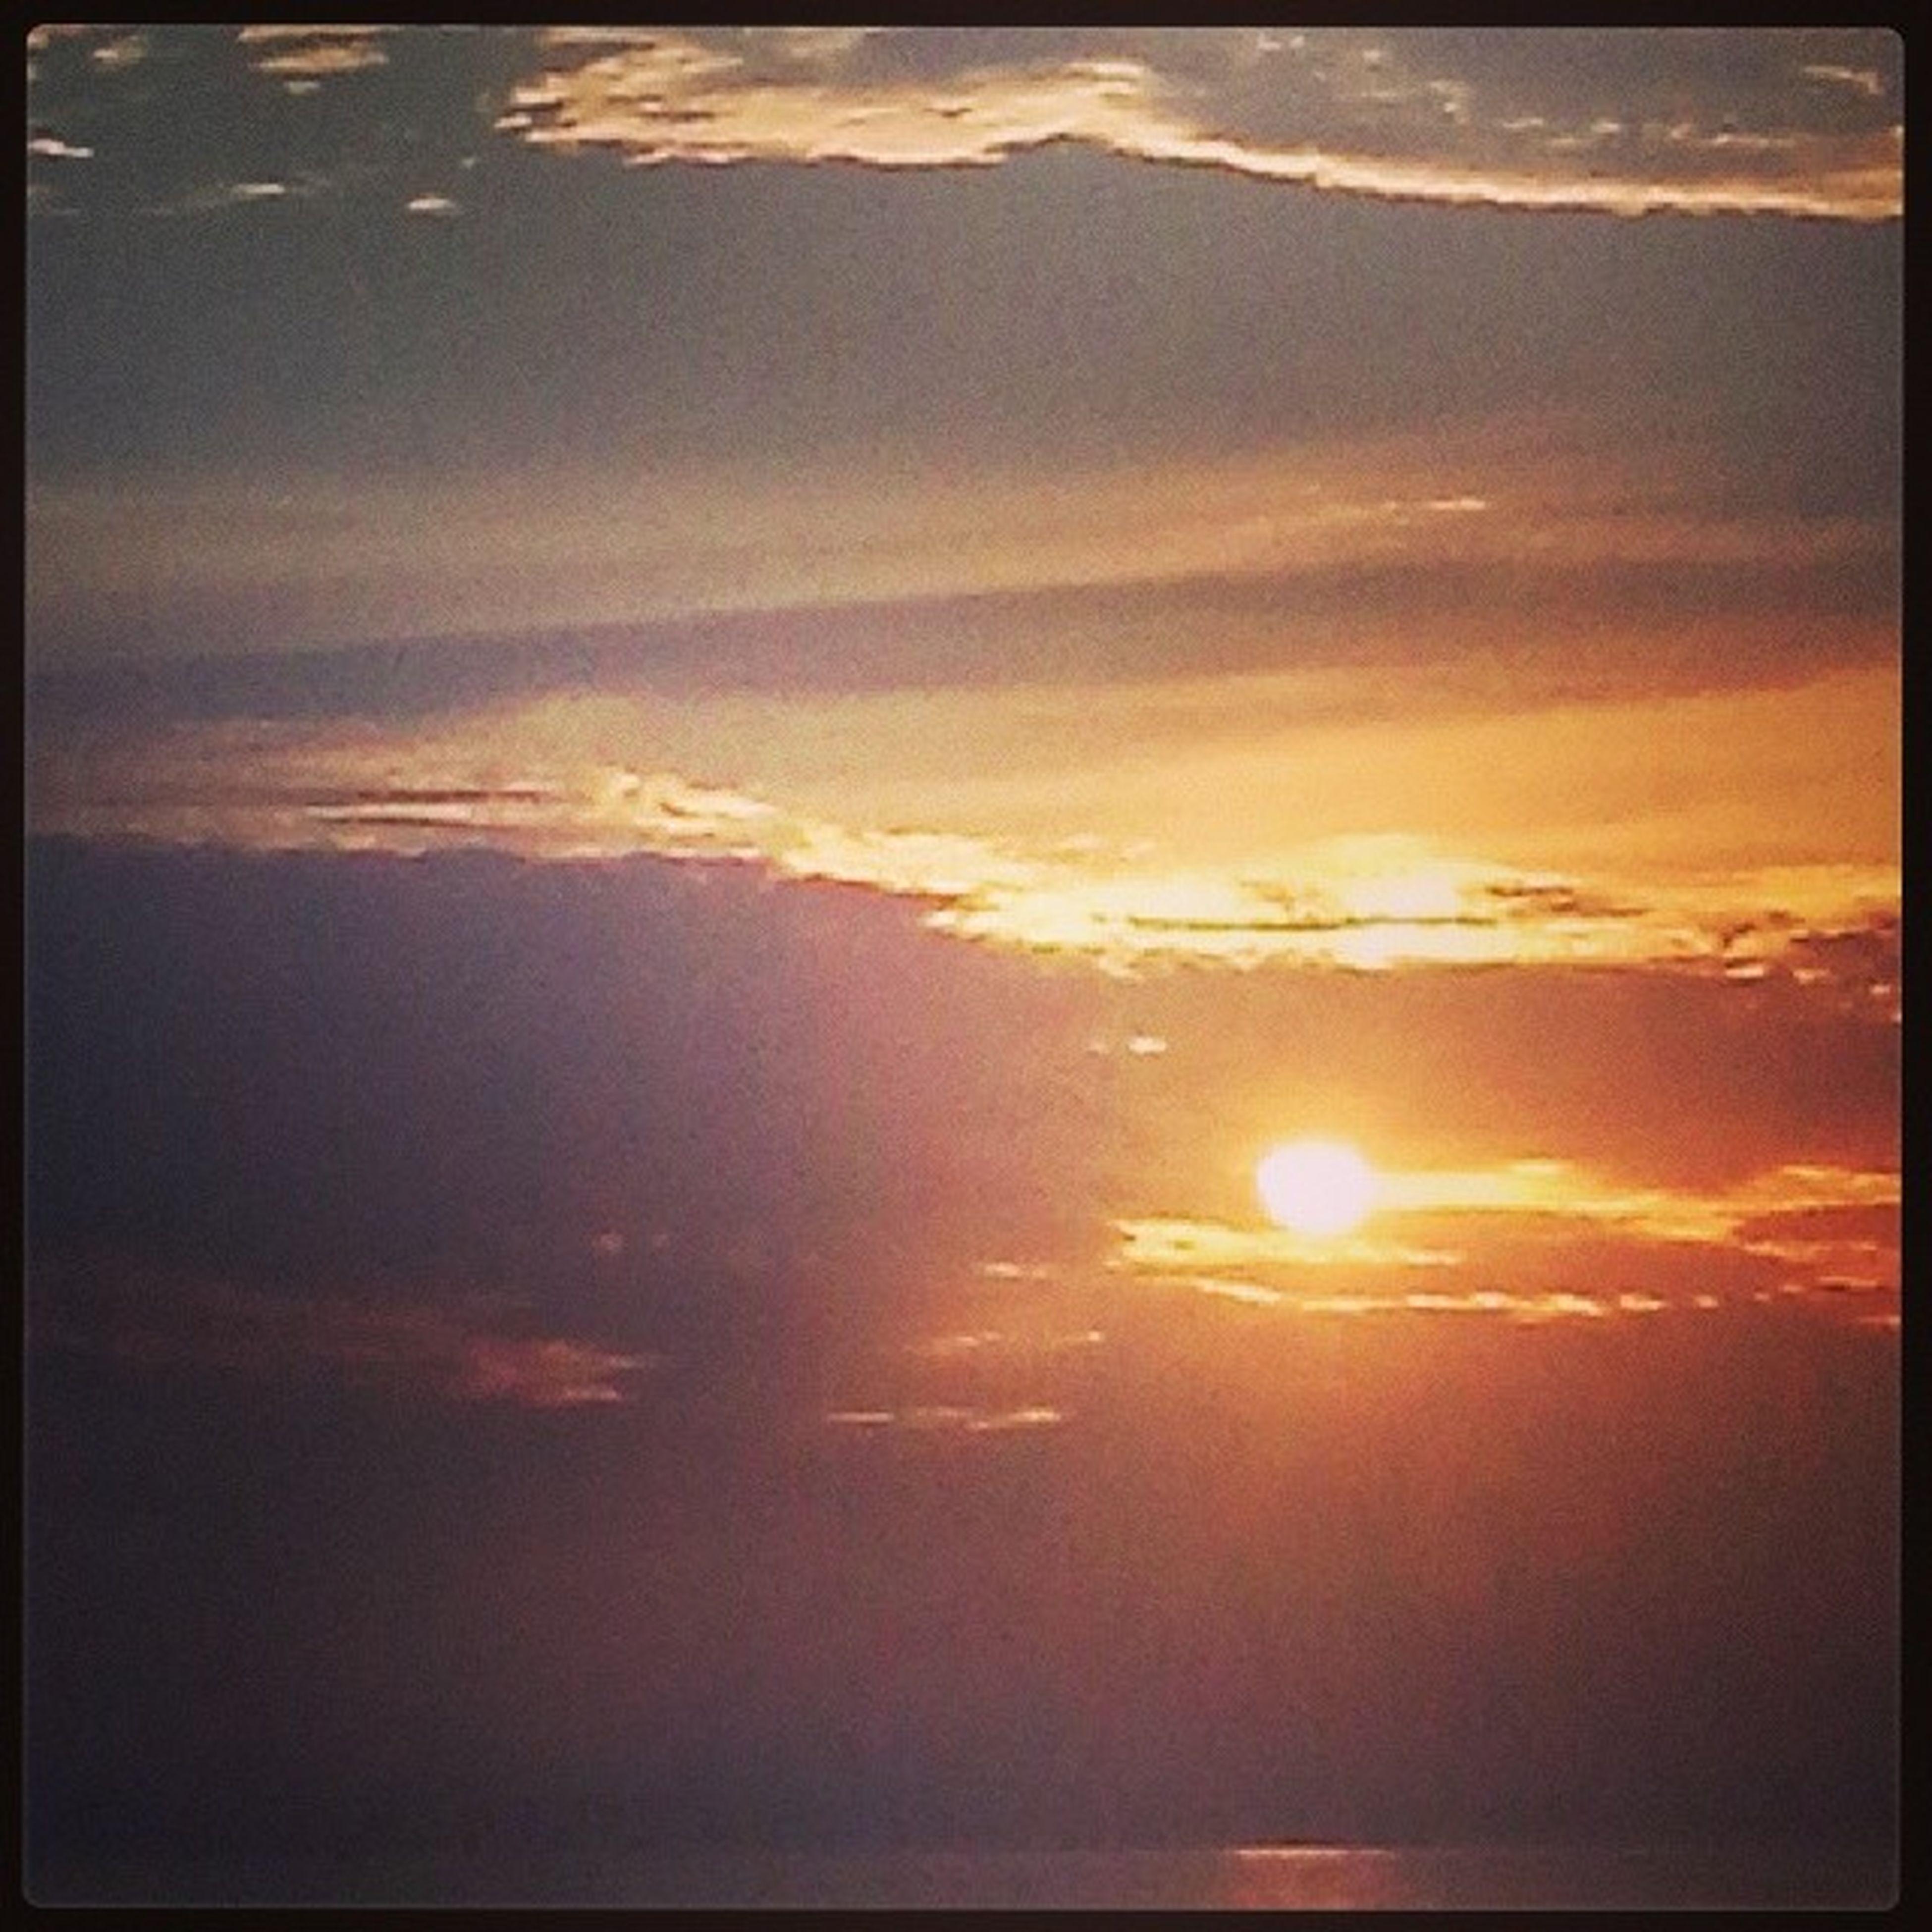 sunset, transfer print, sun, scenics, beauty in nature, orange color, auto post production filter, tranquility, sky, tranquil scene, nature, idyllic, cloud - sky, sunlight, backgrounds, sunbeam, outdoors, no people, majestic, cloud